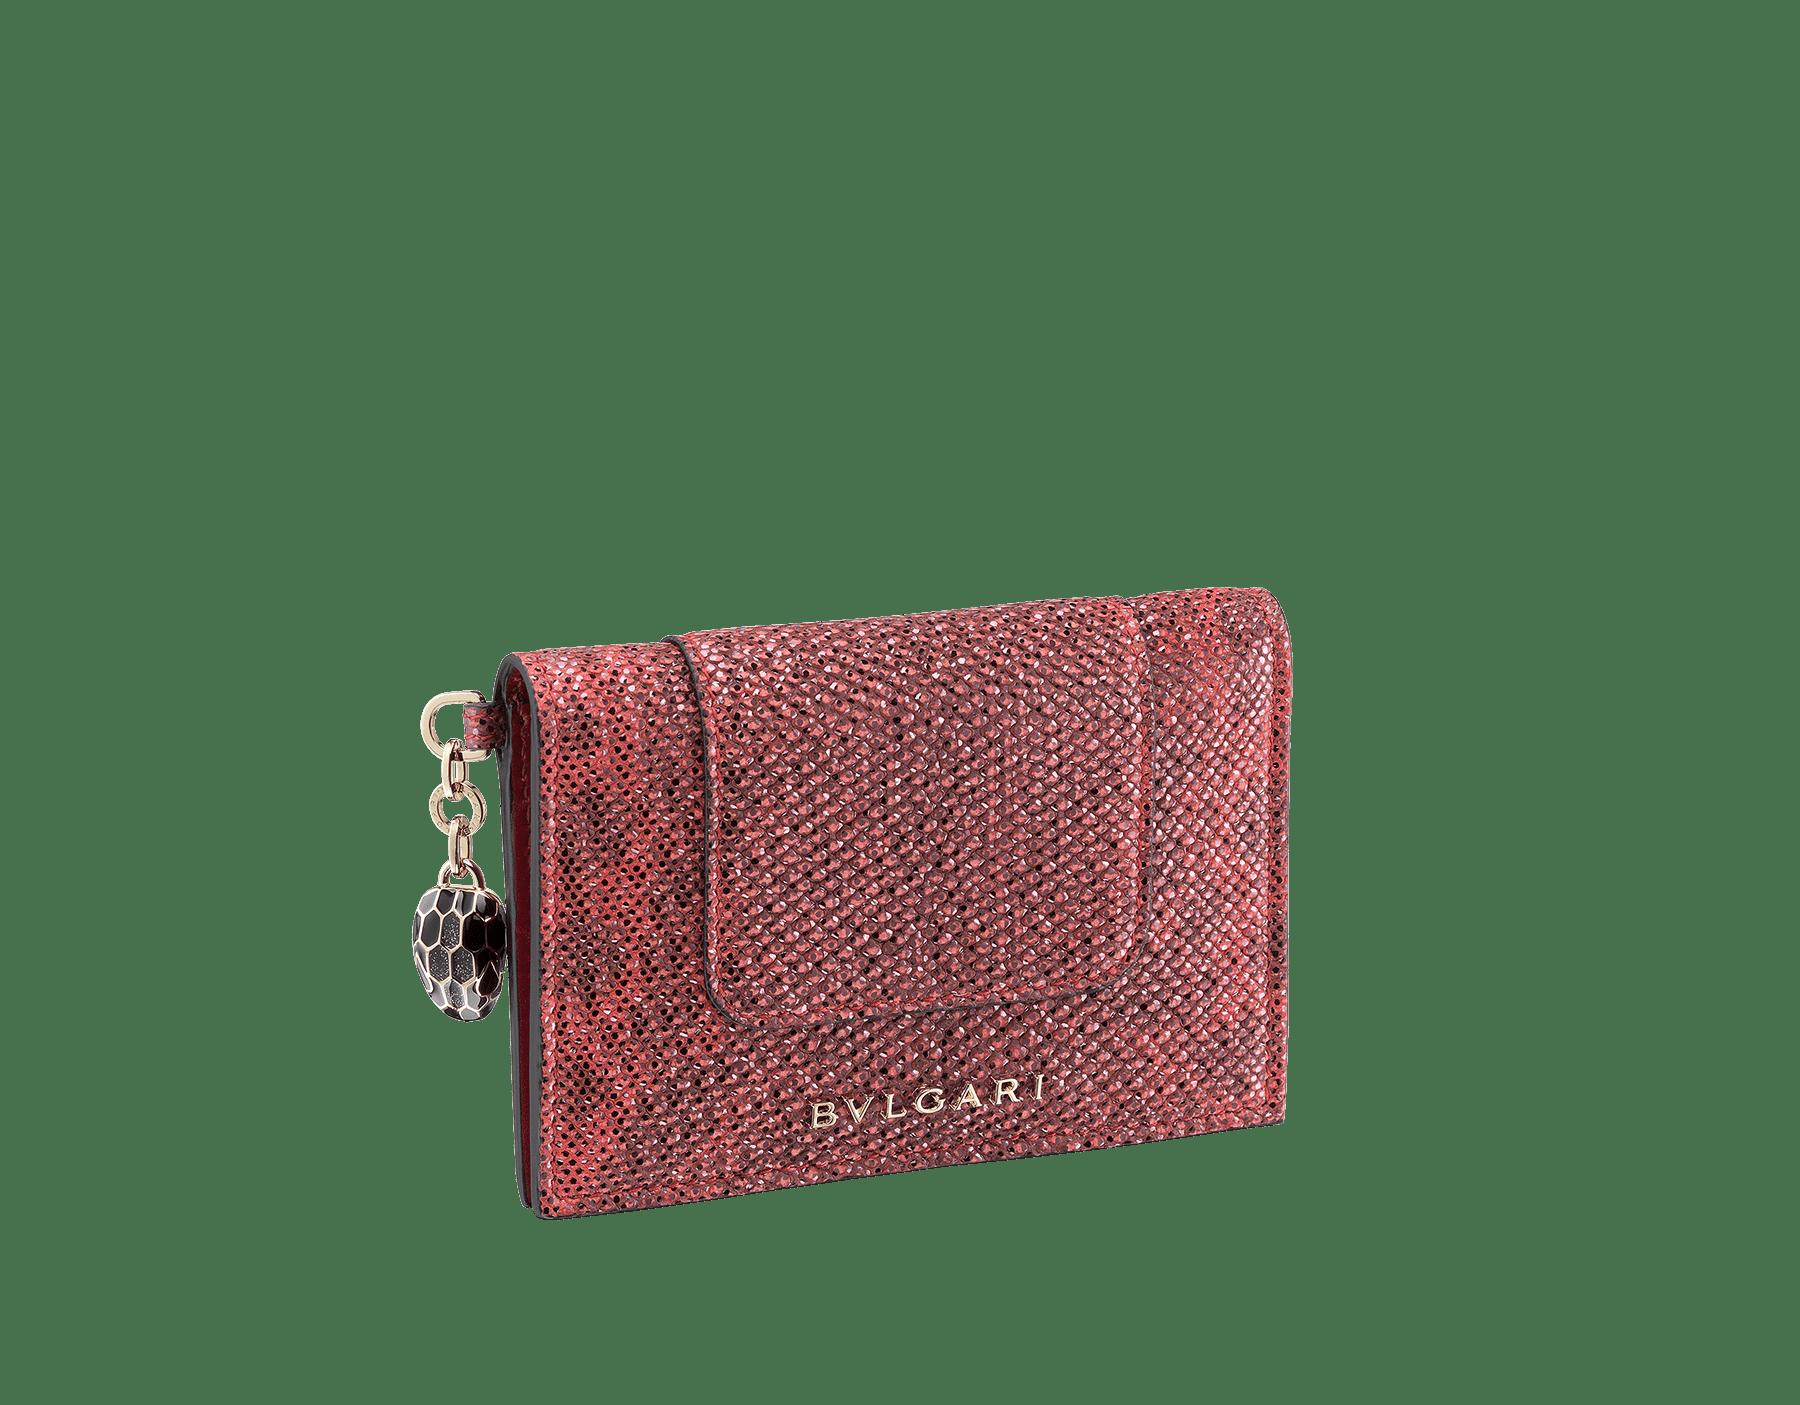 Serpenti Forever 寶石紅金屬光澤水蛇皮折式信用卡夾。經典蛇頭吊飾飾以黑色和燦銀色琺瑯,蛇眼飾以黑色琺瑯。 SEA-CC-HOLDER-FOLD-MKb image 1